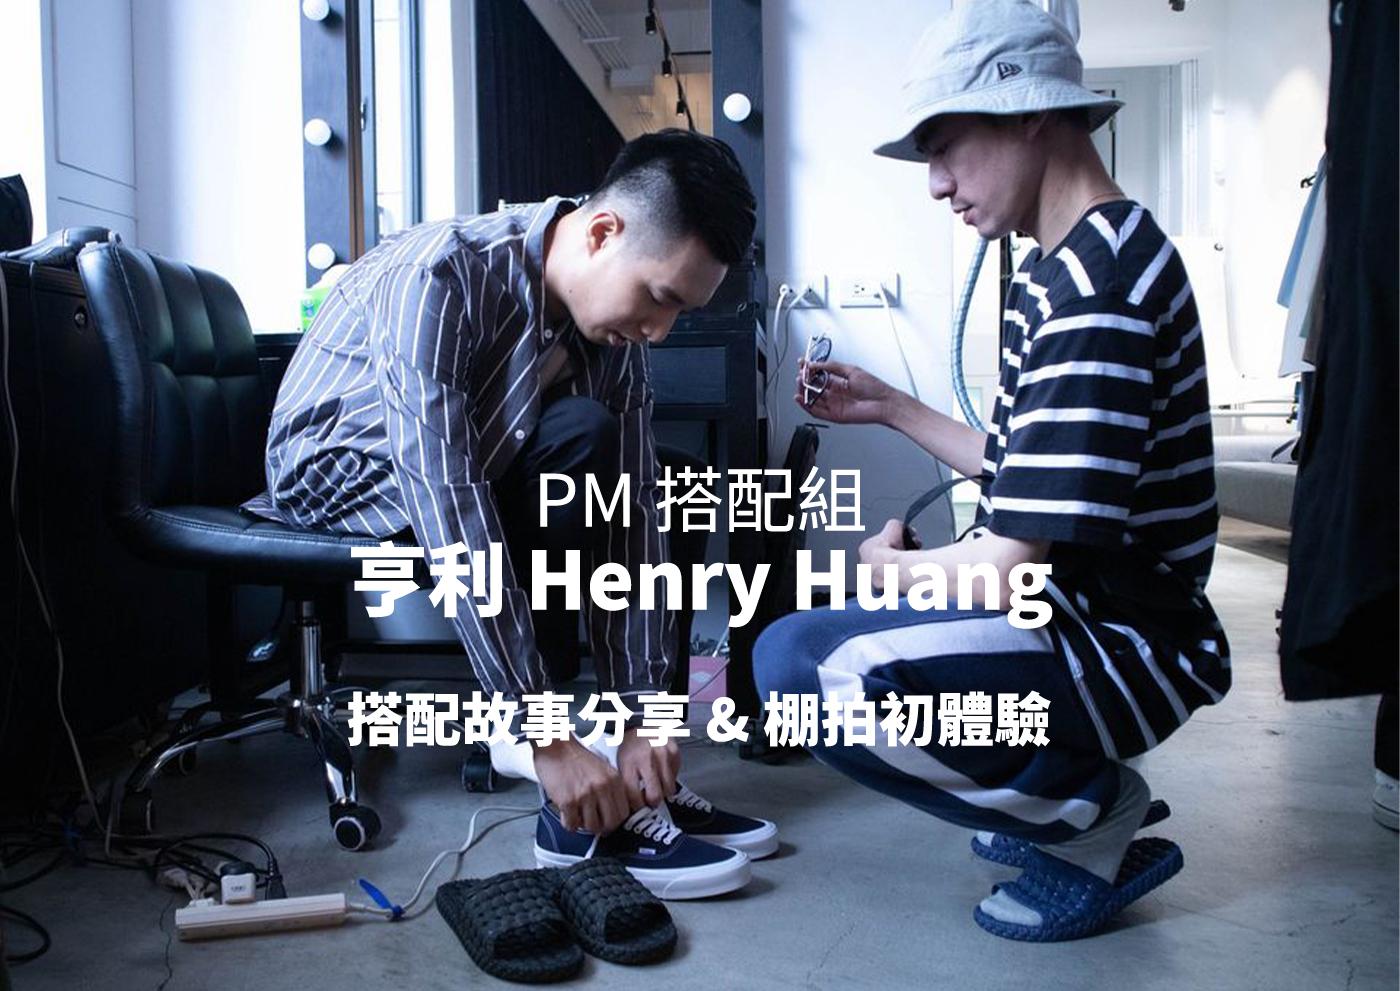 pm搭配組,棚拍分享,亨利,Henry Huang,plain-me,plain-me 朋友,搭配故事,棚拍,棚拍分享